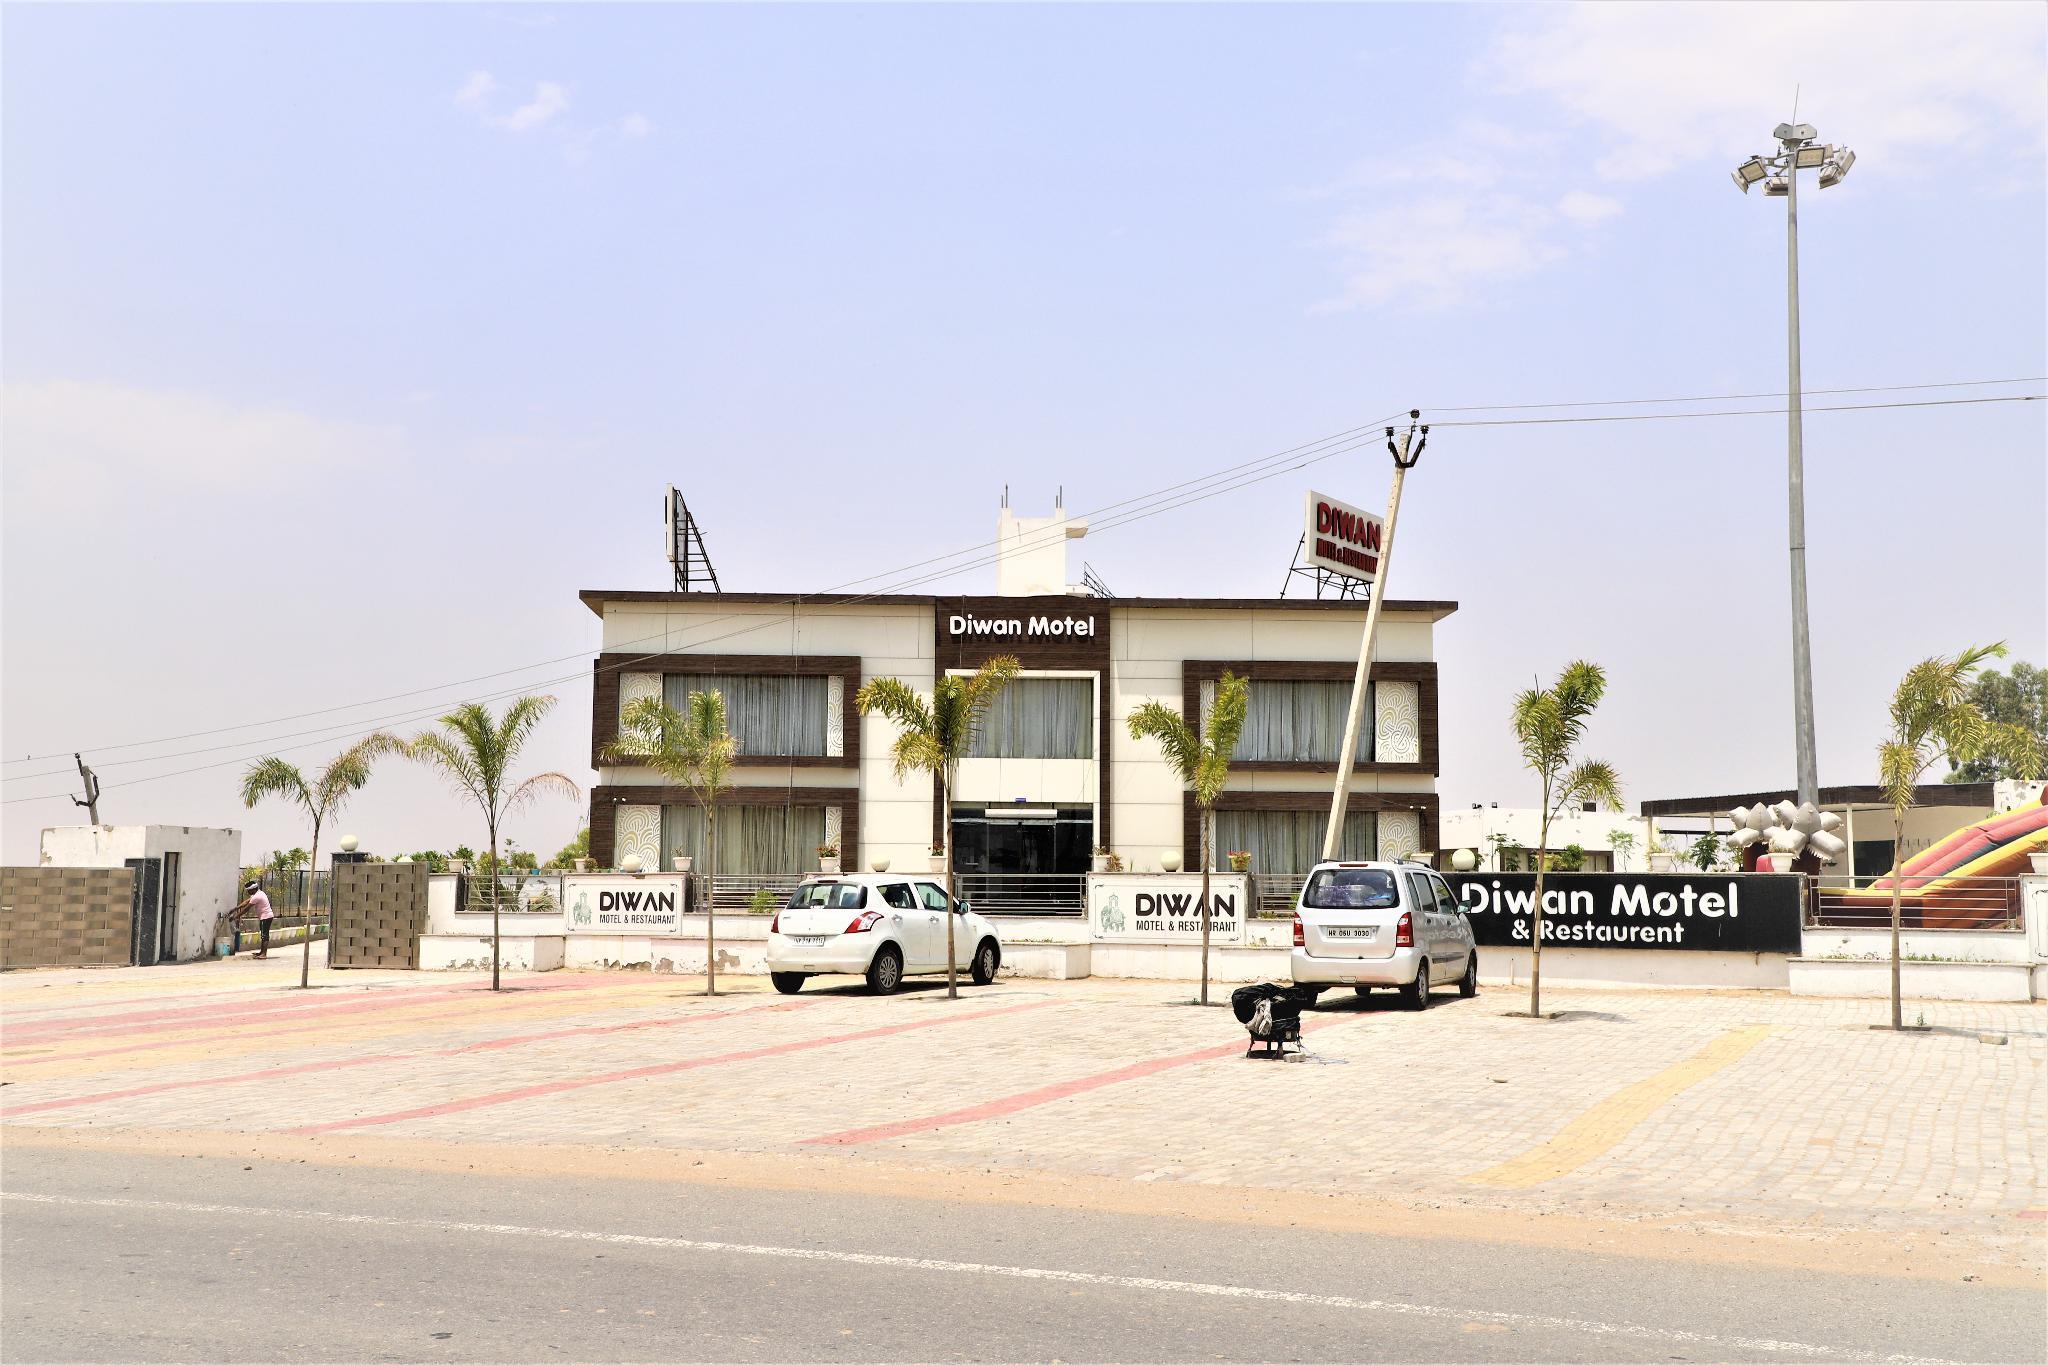 Diwan Hotel And Restaurant